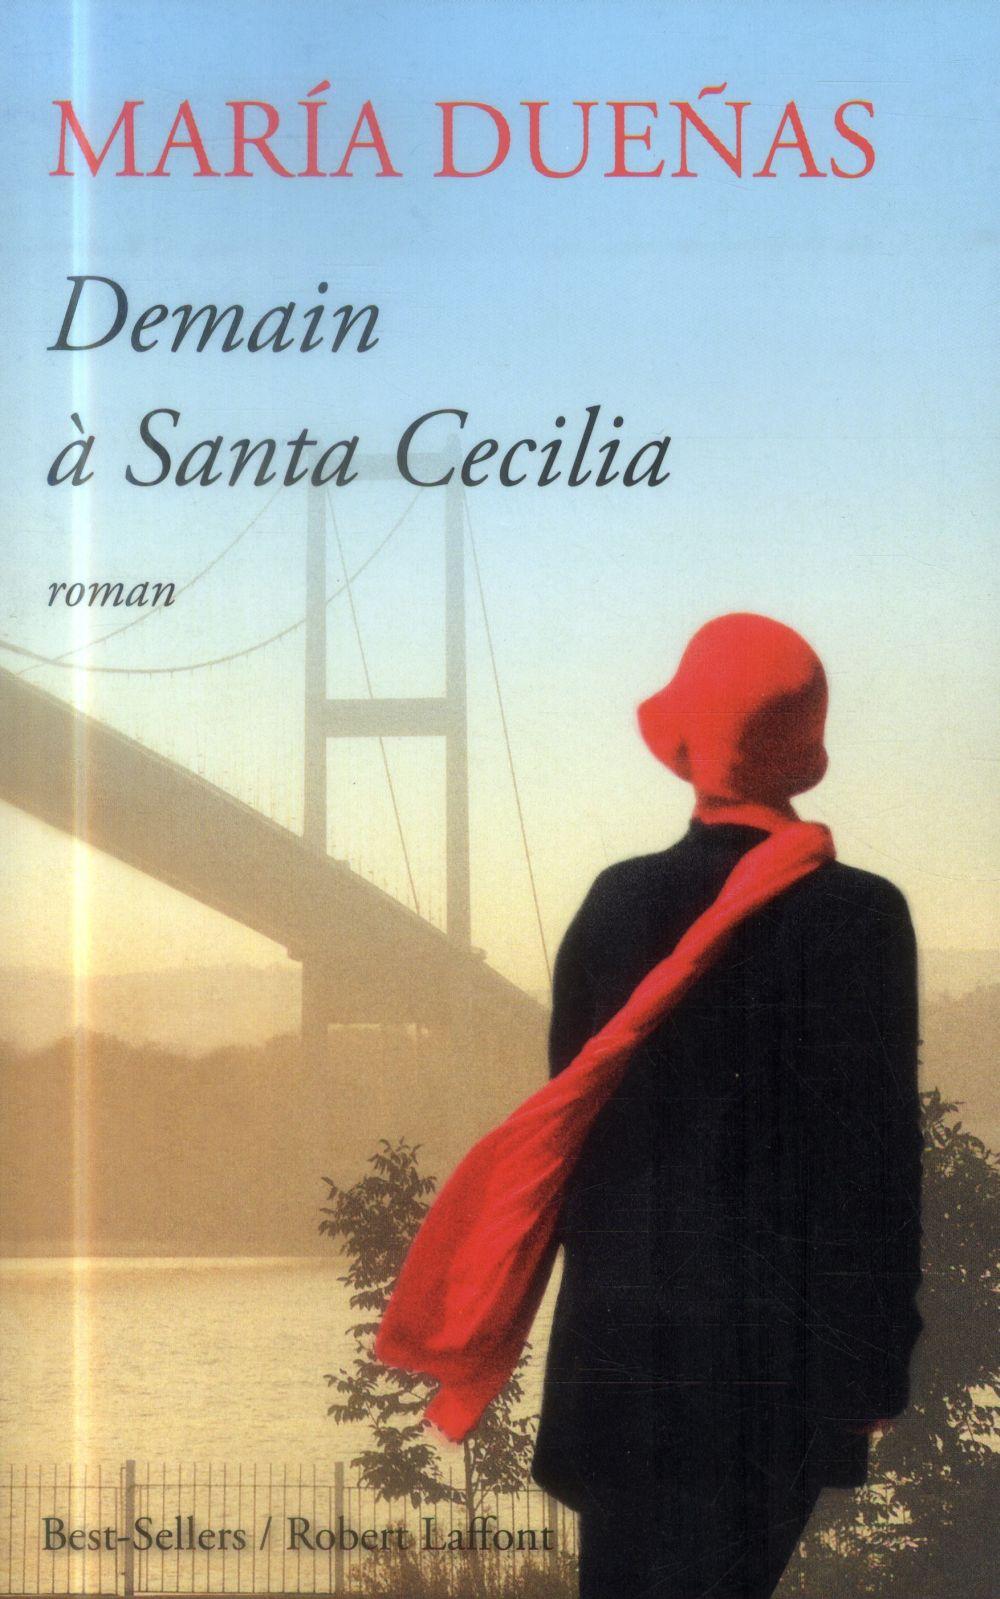 DEMAIN A SANTA CECILIA